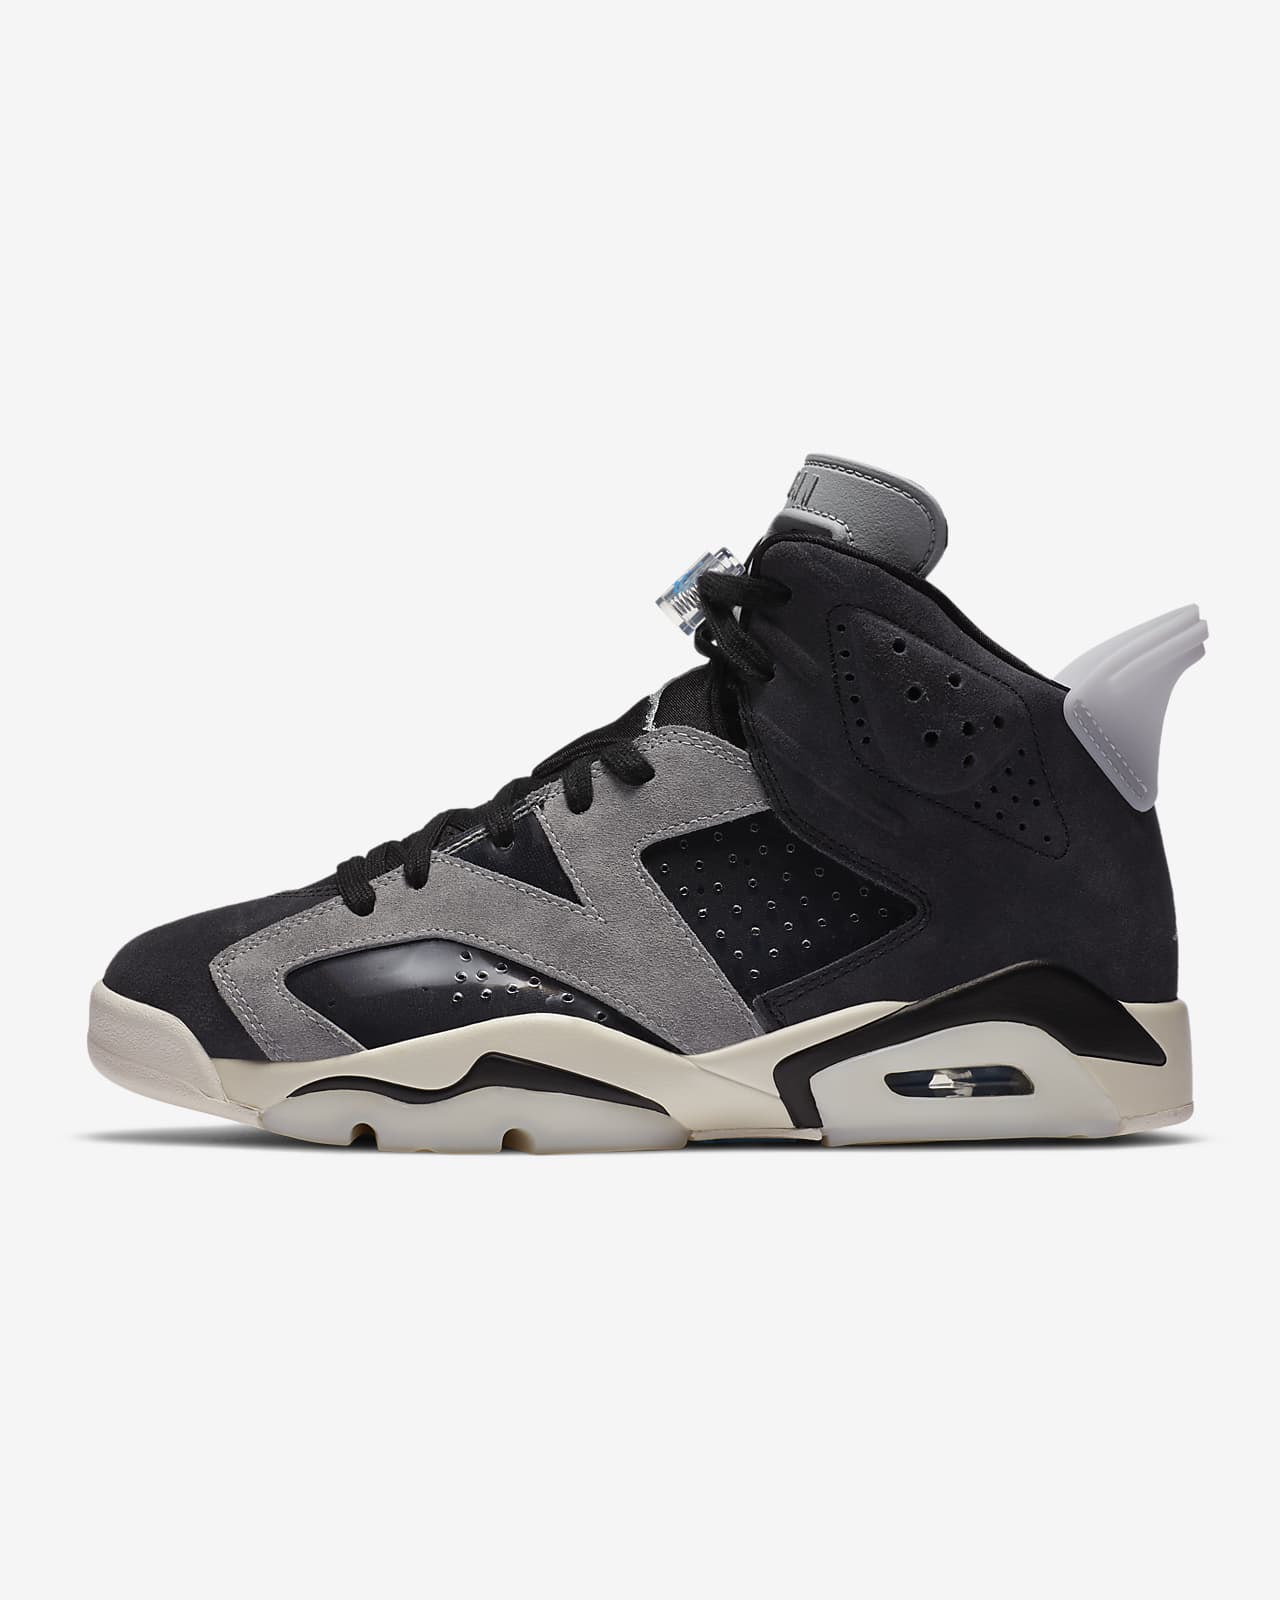 Air Jordan 6 Retro 女鞋。Nike TW